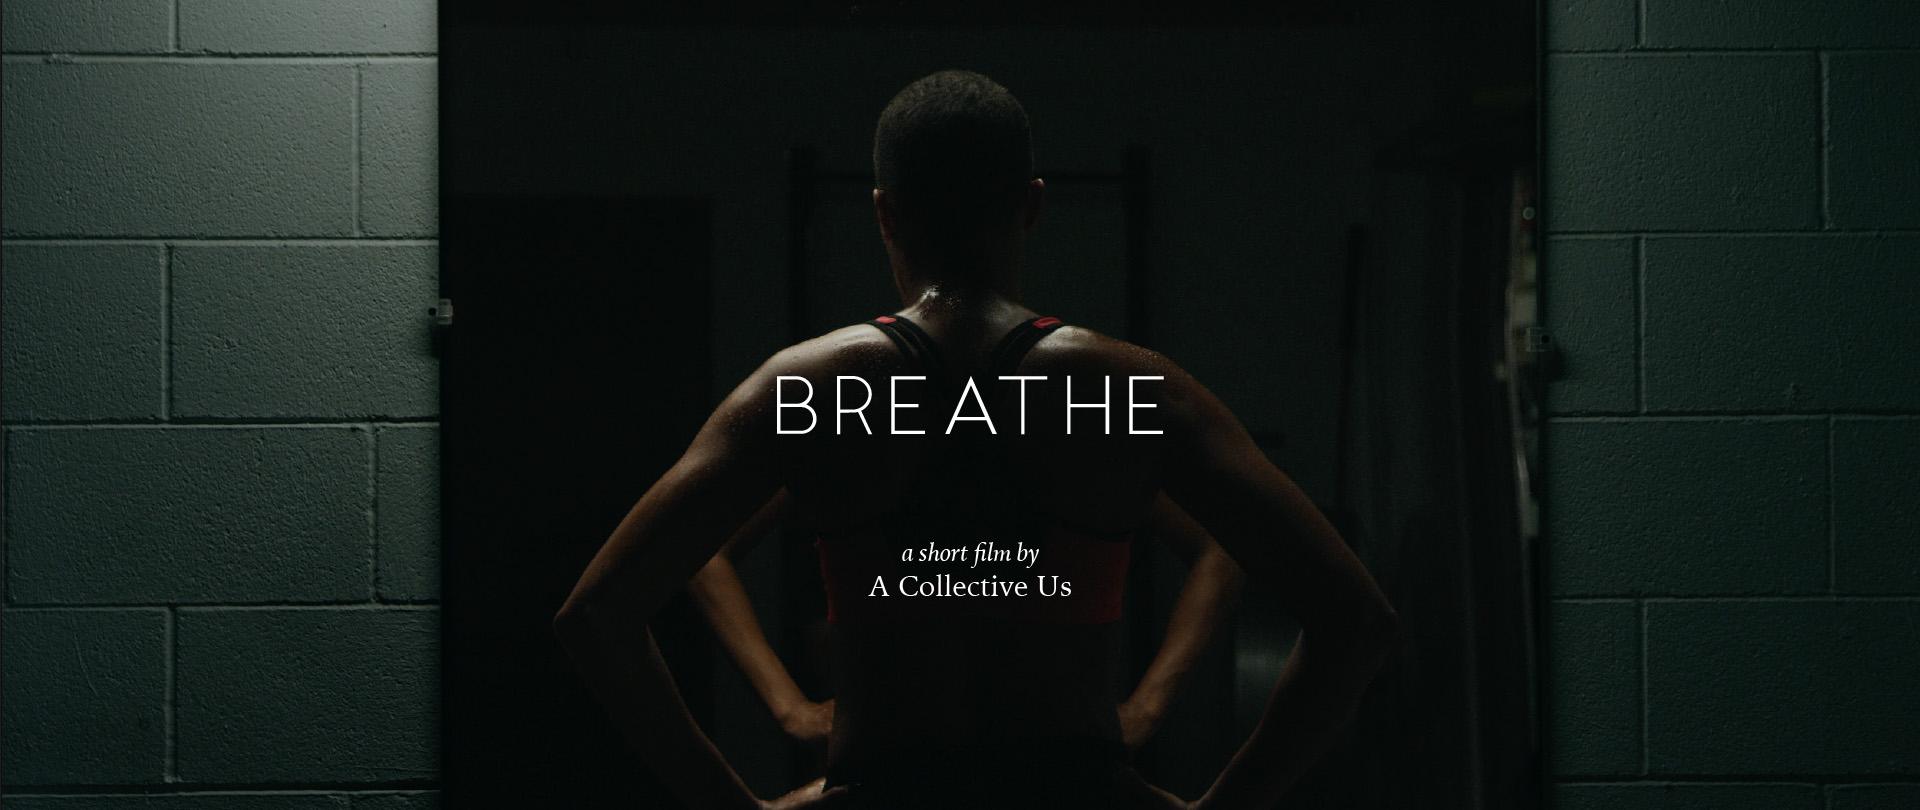 Breathe | A Collective Us